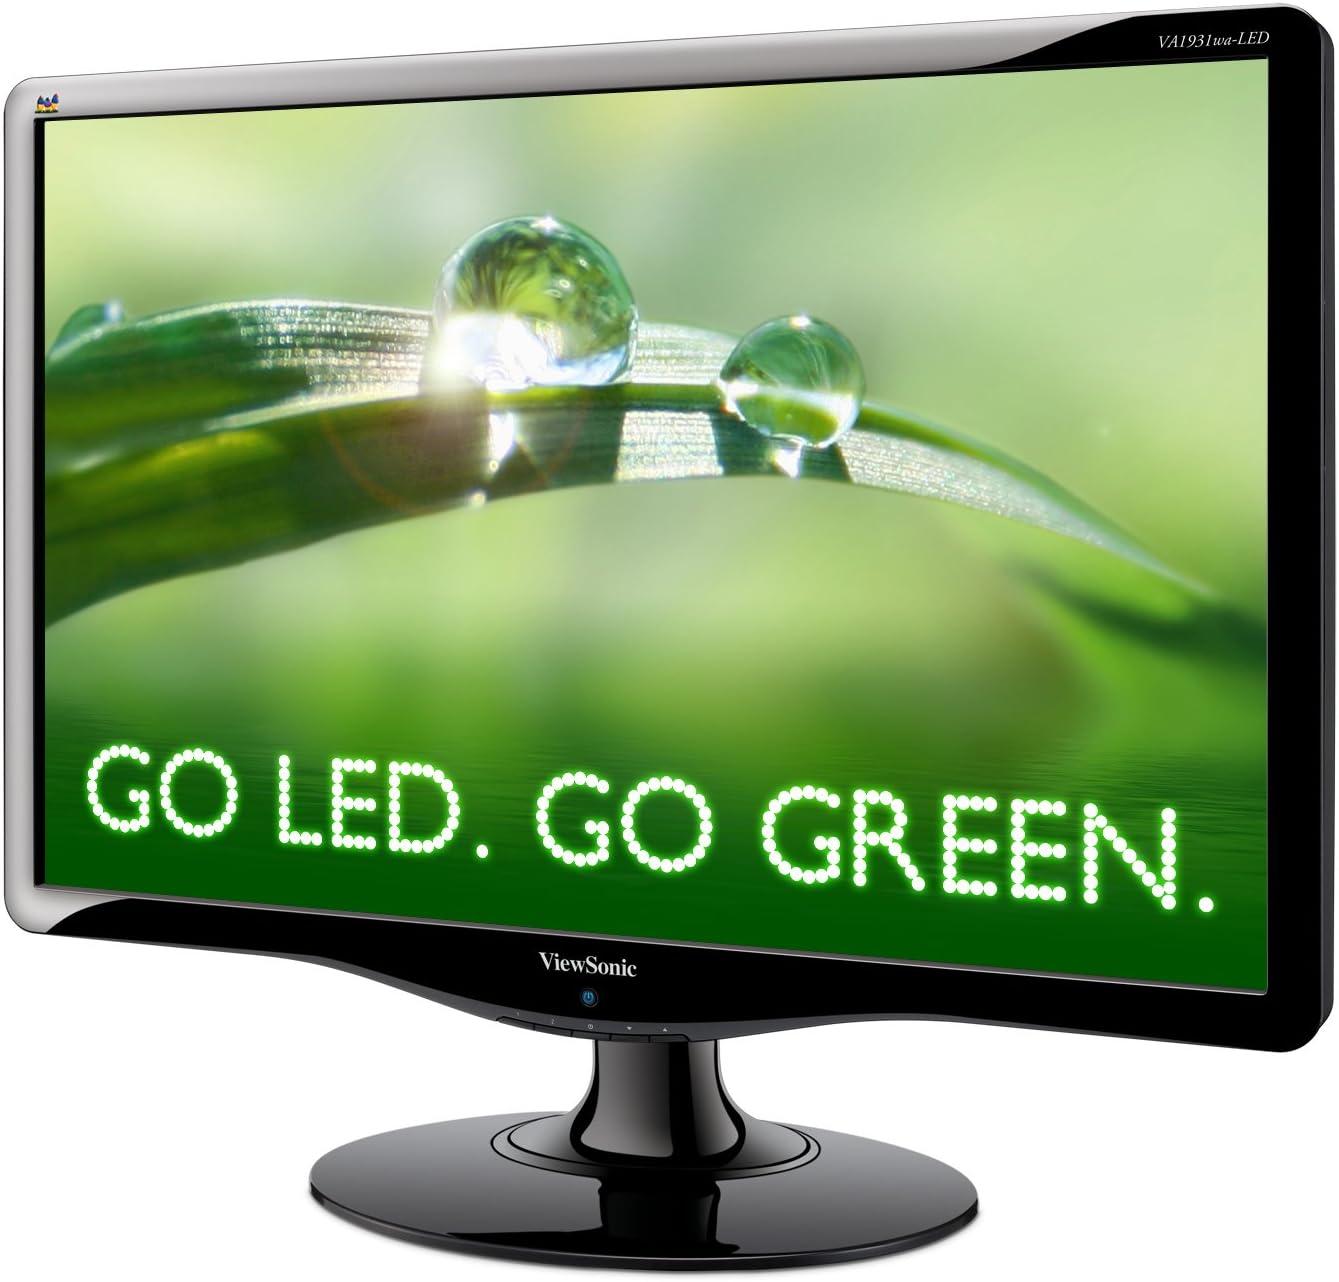 Viewsonic VA1931WA-LED - Monitor LED Panorámico, 18.5 pulgadas ...